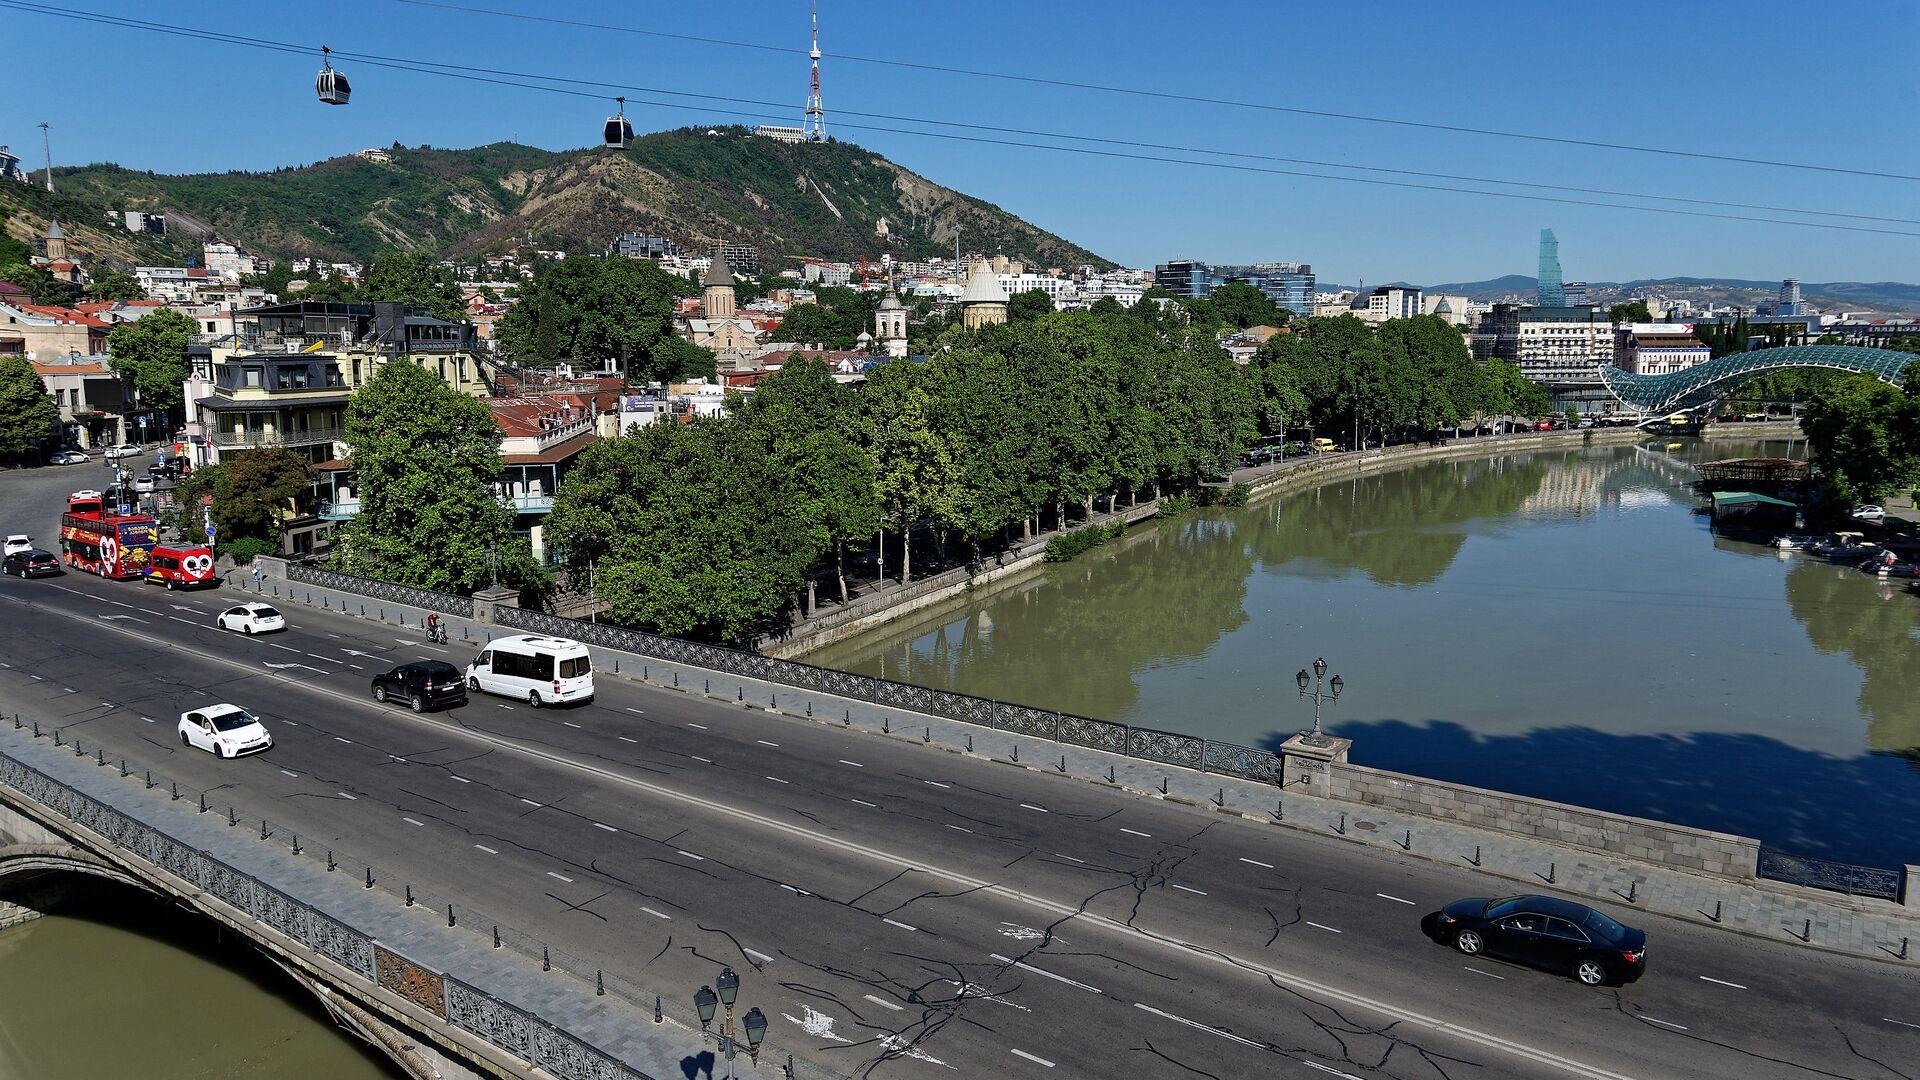 Вид на город Тбилиси - Метехский мост, набережная, река Кура, Мтацминда - Sputnik Грузия, 1920, 29.09.2021